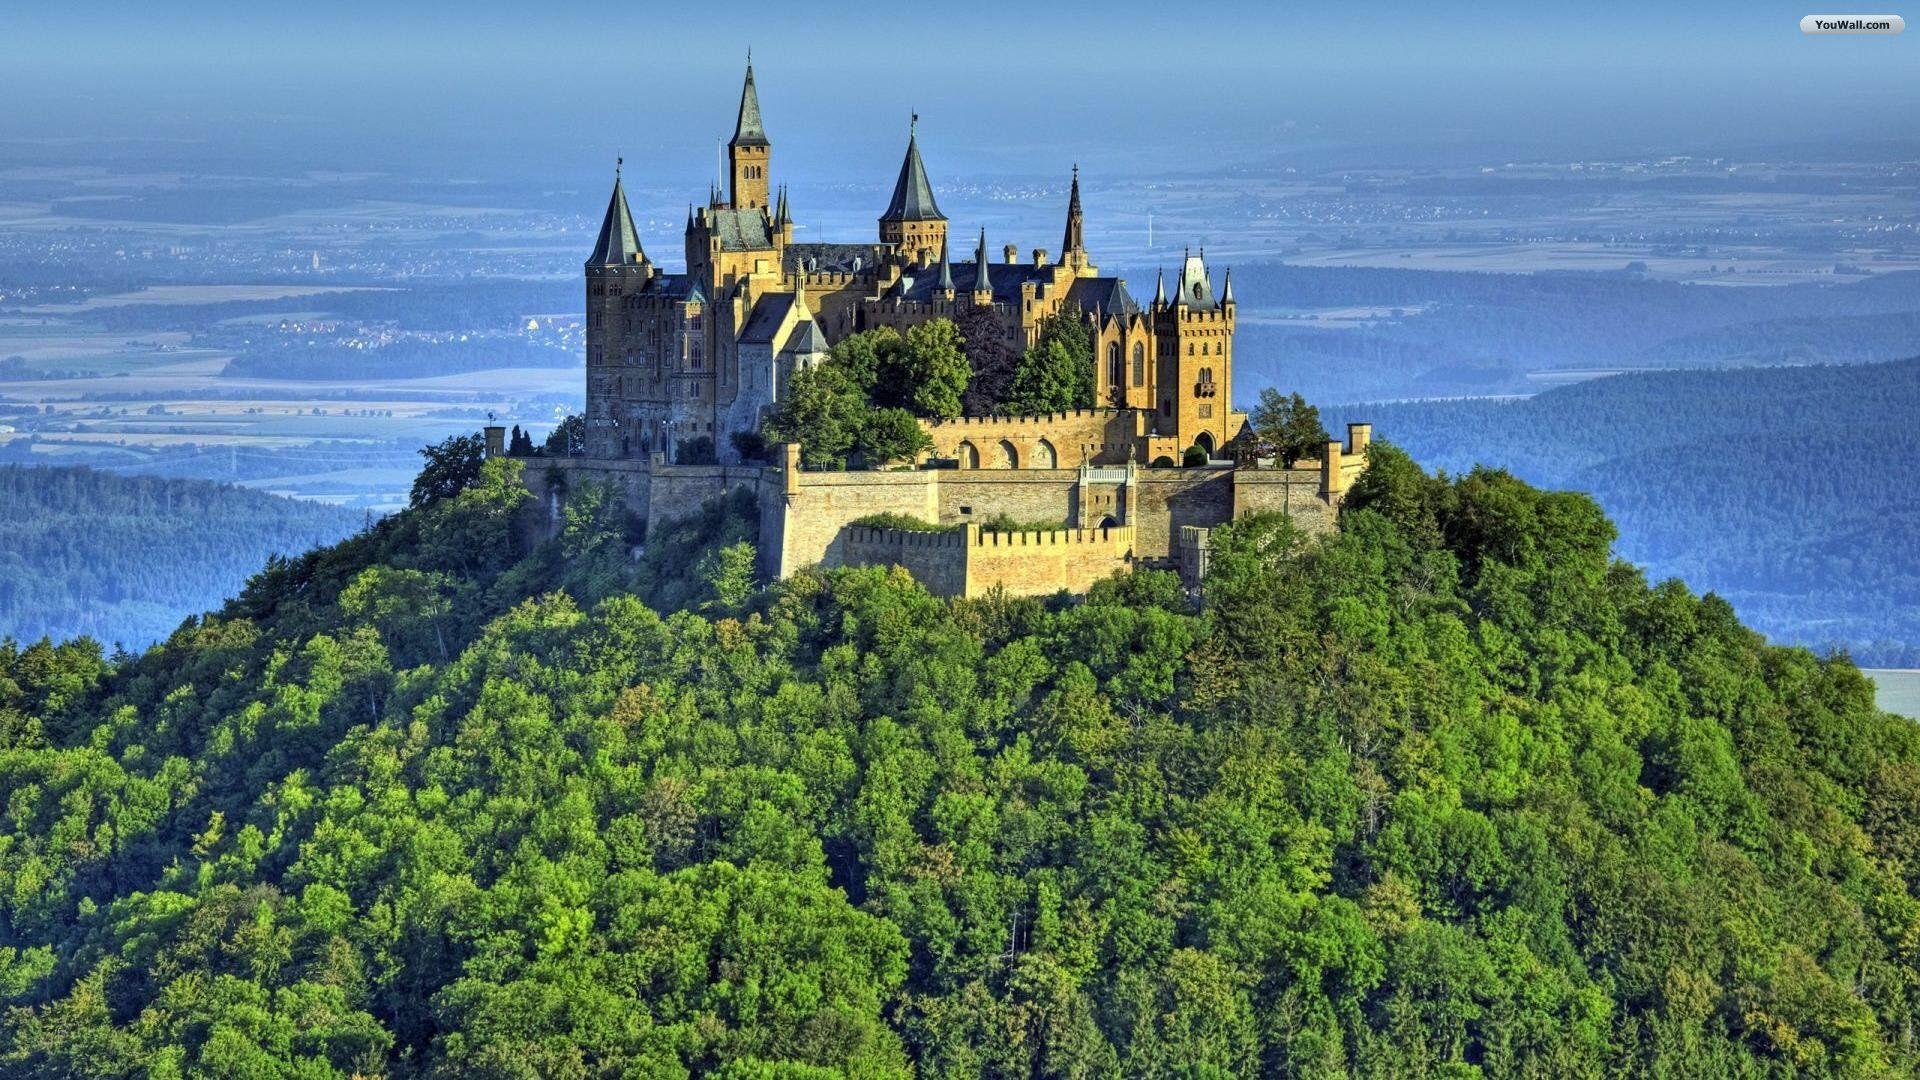 Castle Hd Pics 05365 Hohenzollern Castle Germany Castles Beautiful Castles